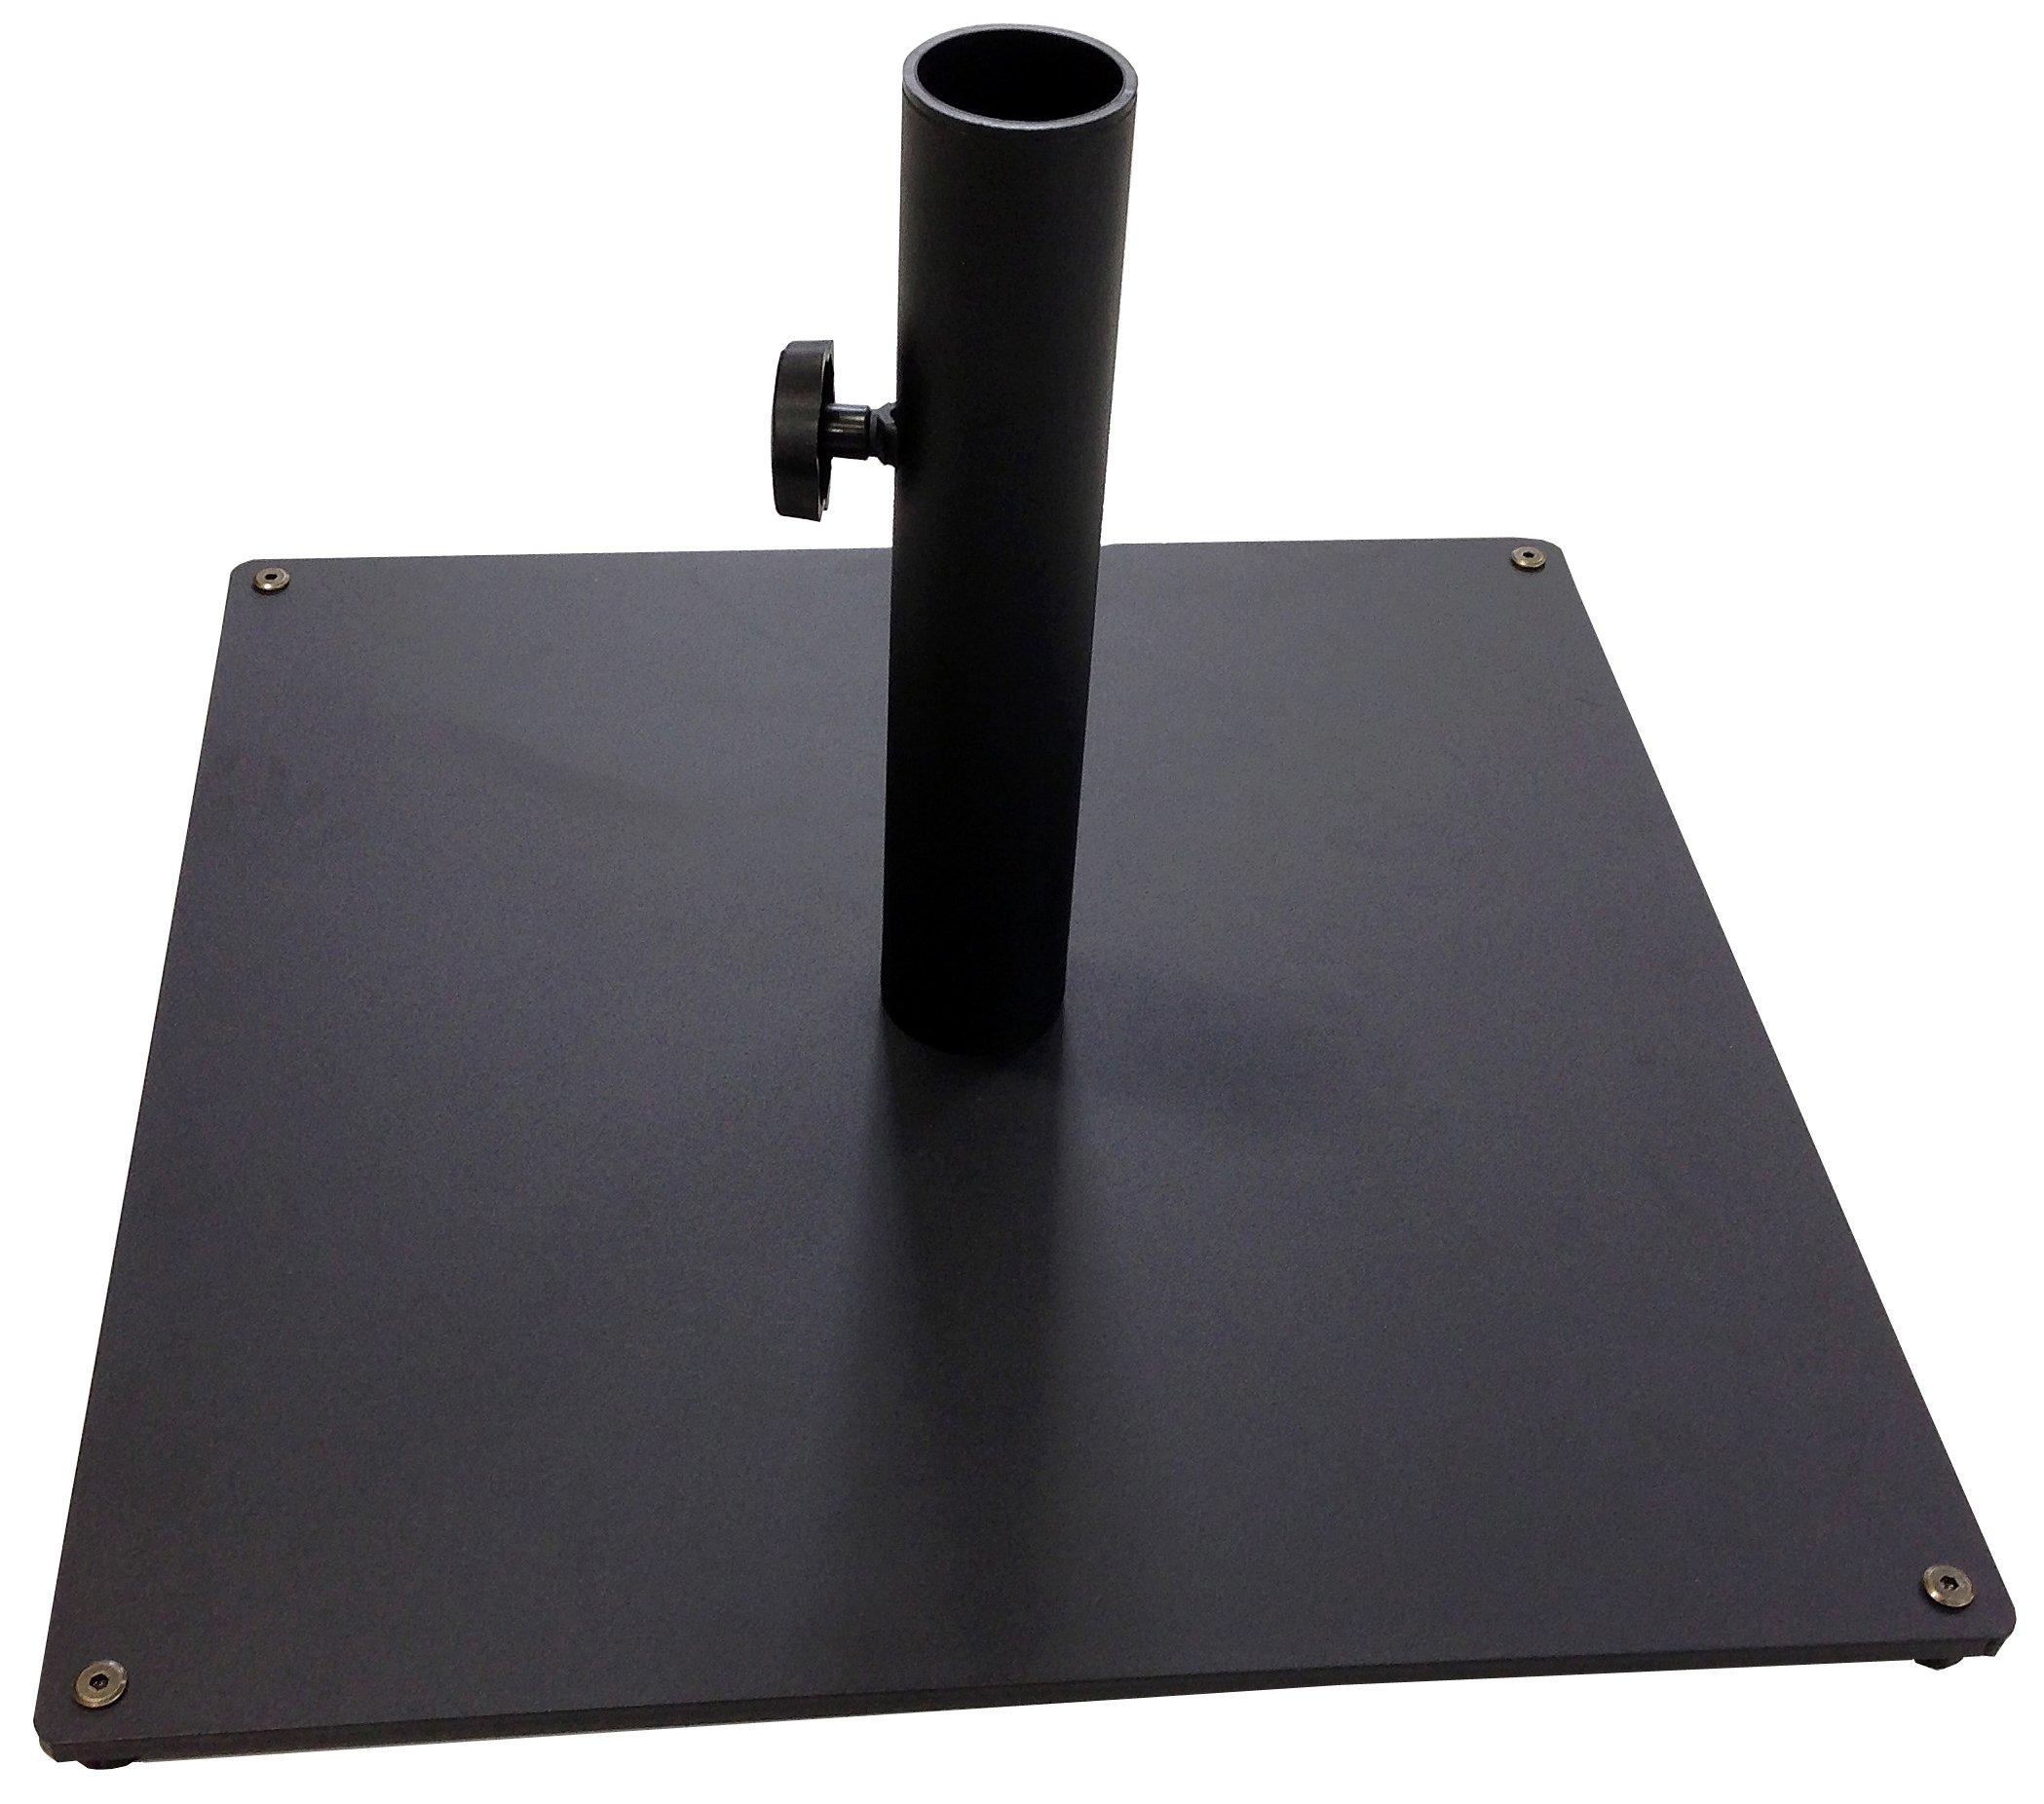 Tropishade Steel Plate Umbrella Base, 36 lbs, Black by Tropishade